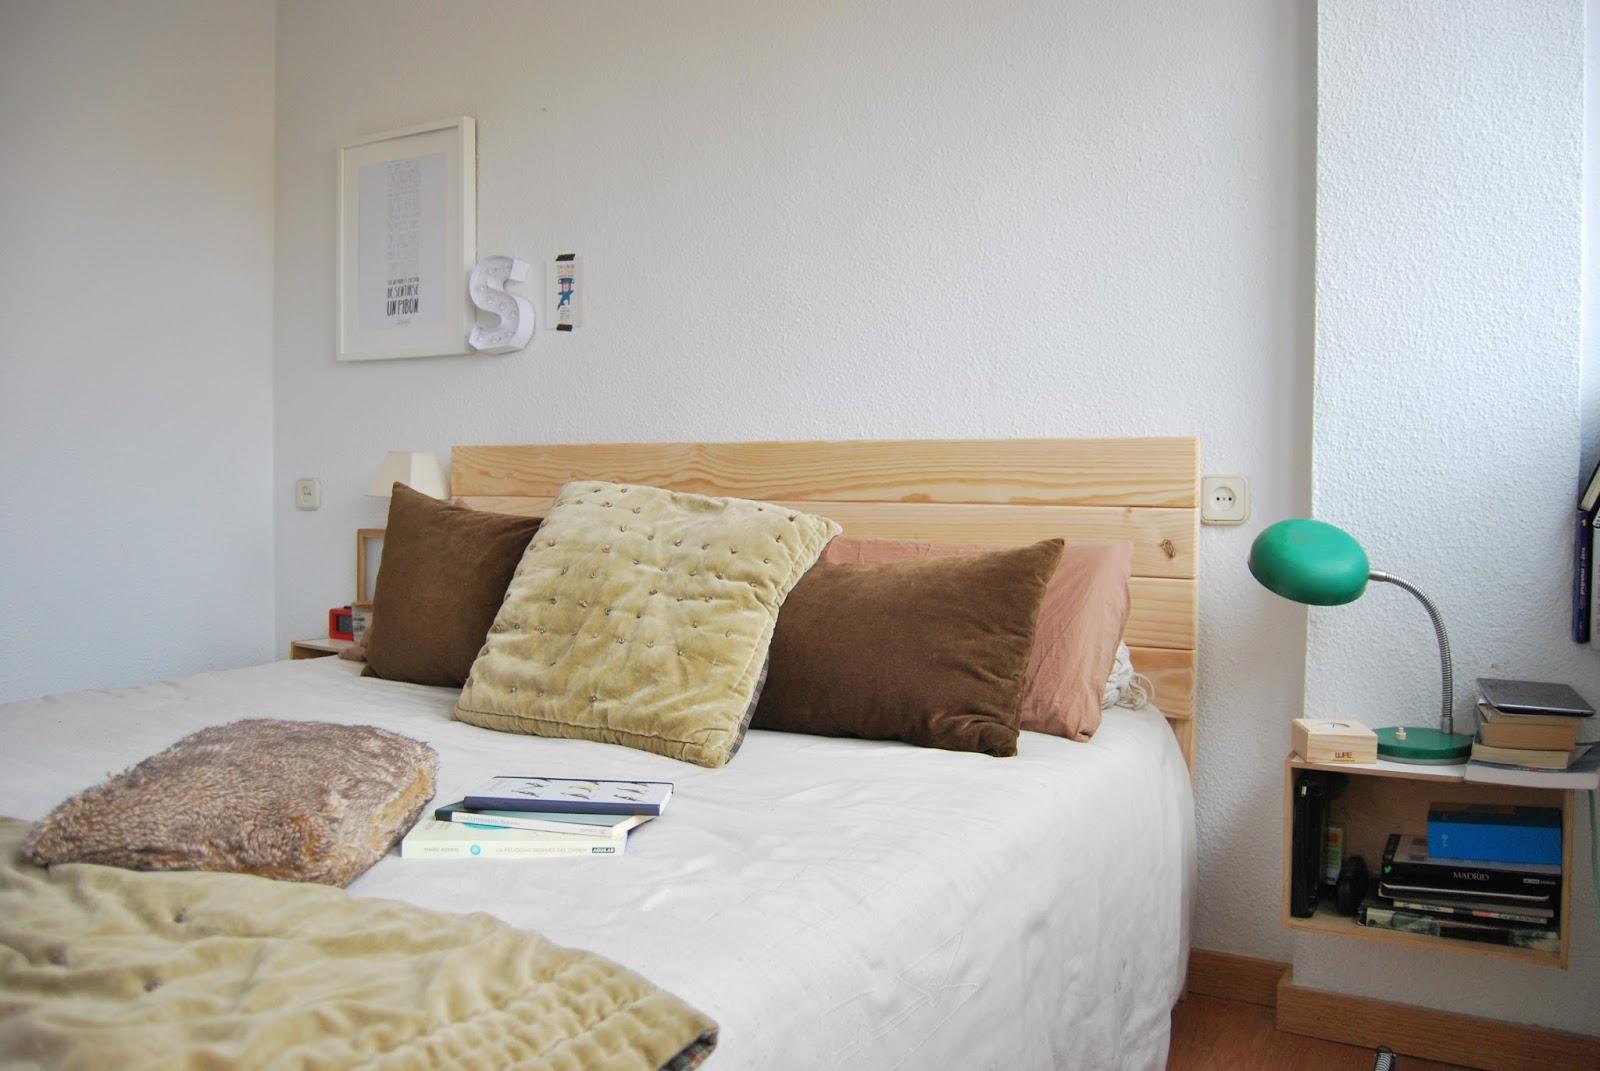 Lufe los muebles baratos del ikea vasco que se han for Muebles vascos